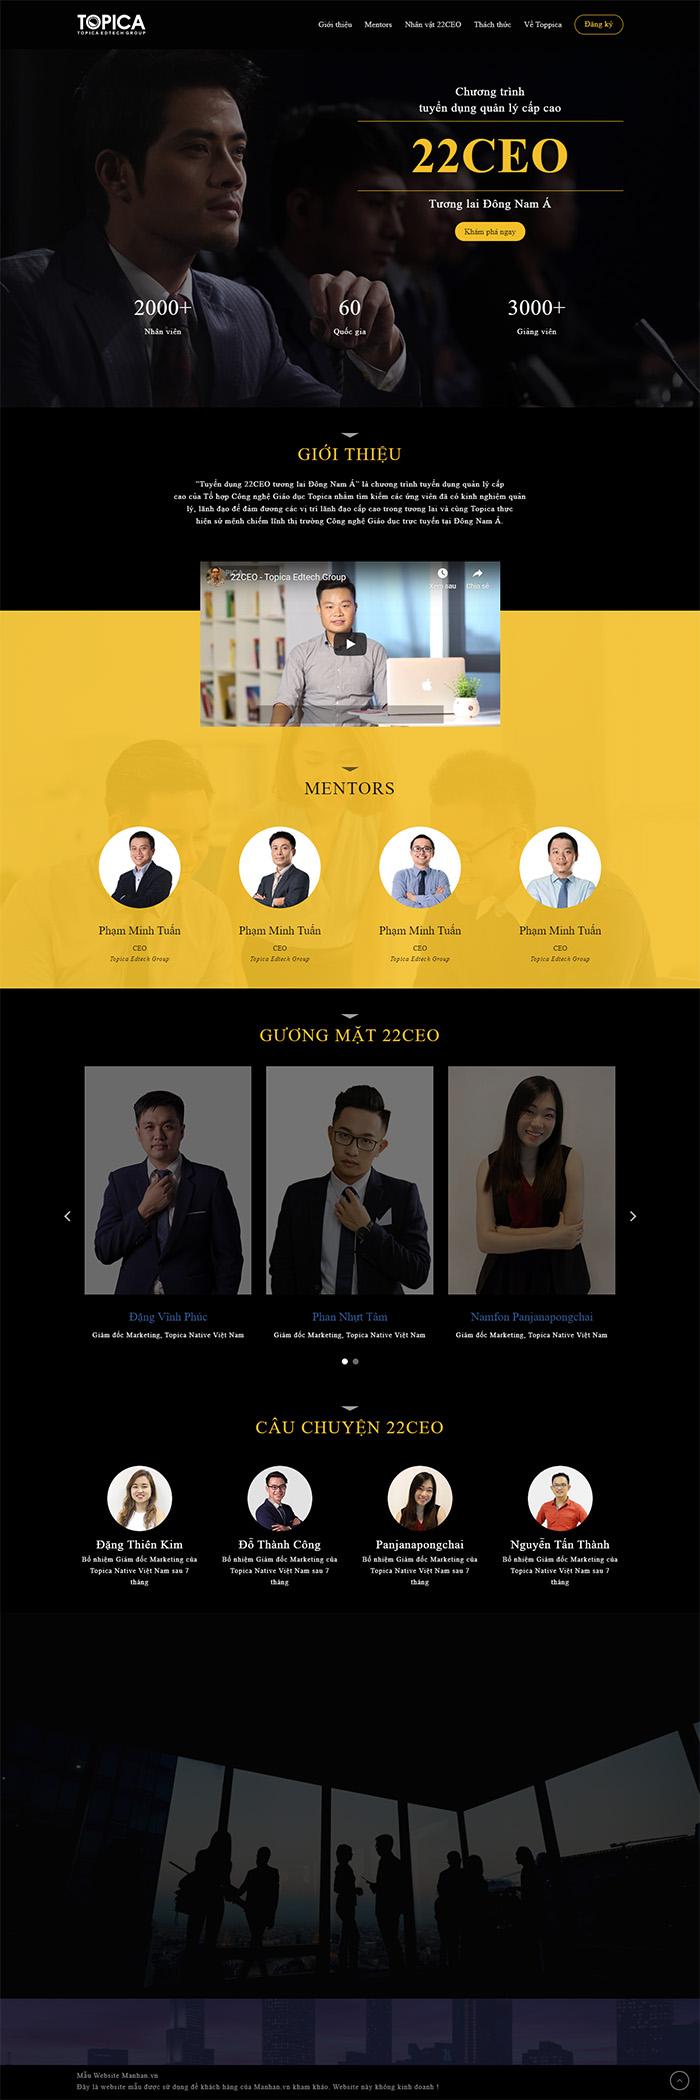 Mẫu thiết kế website Mạnh An Service